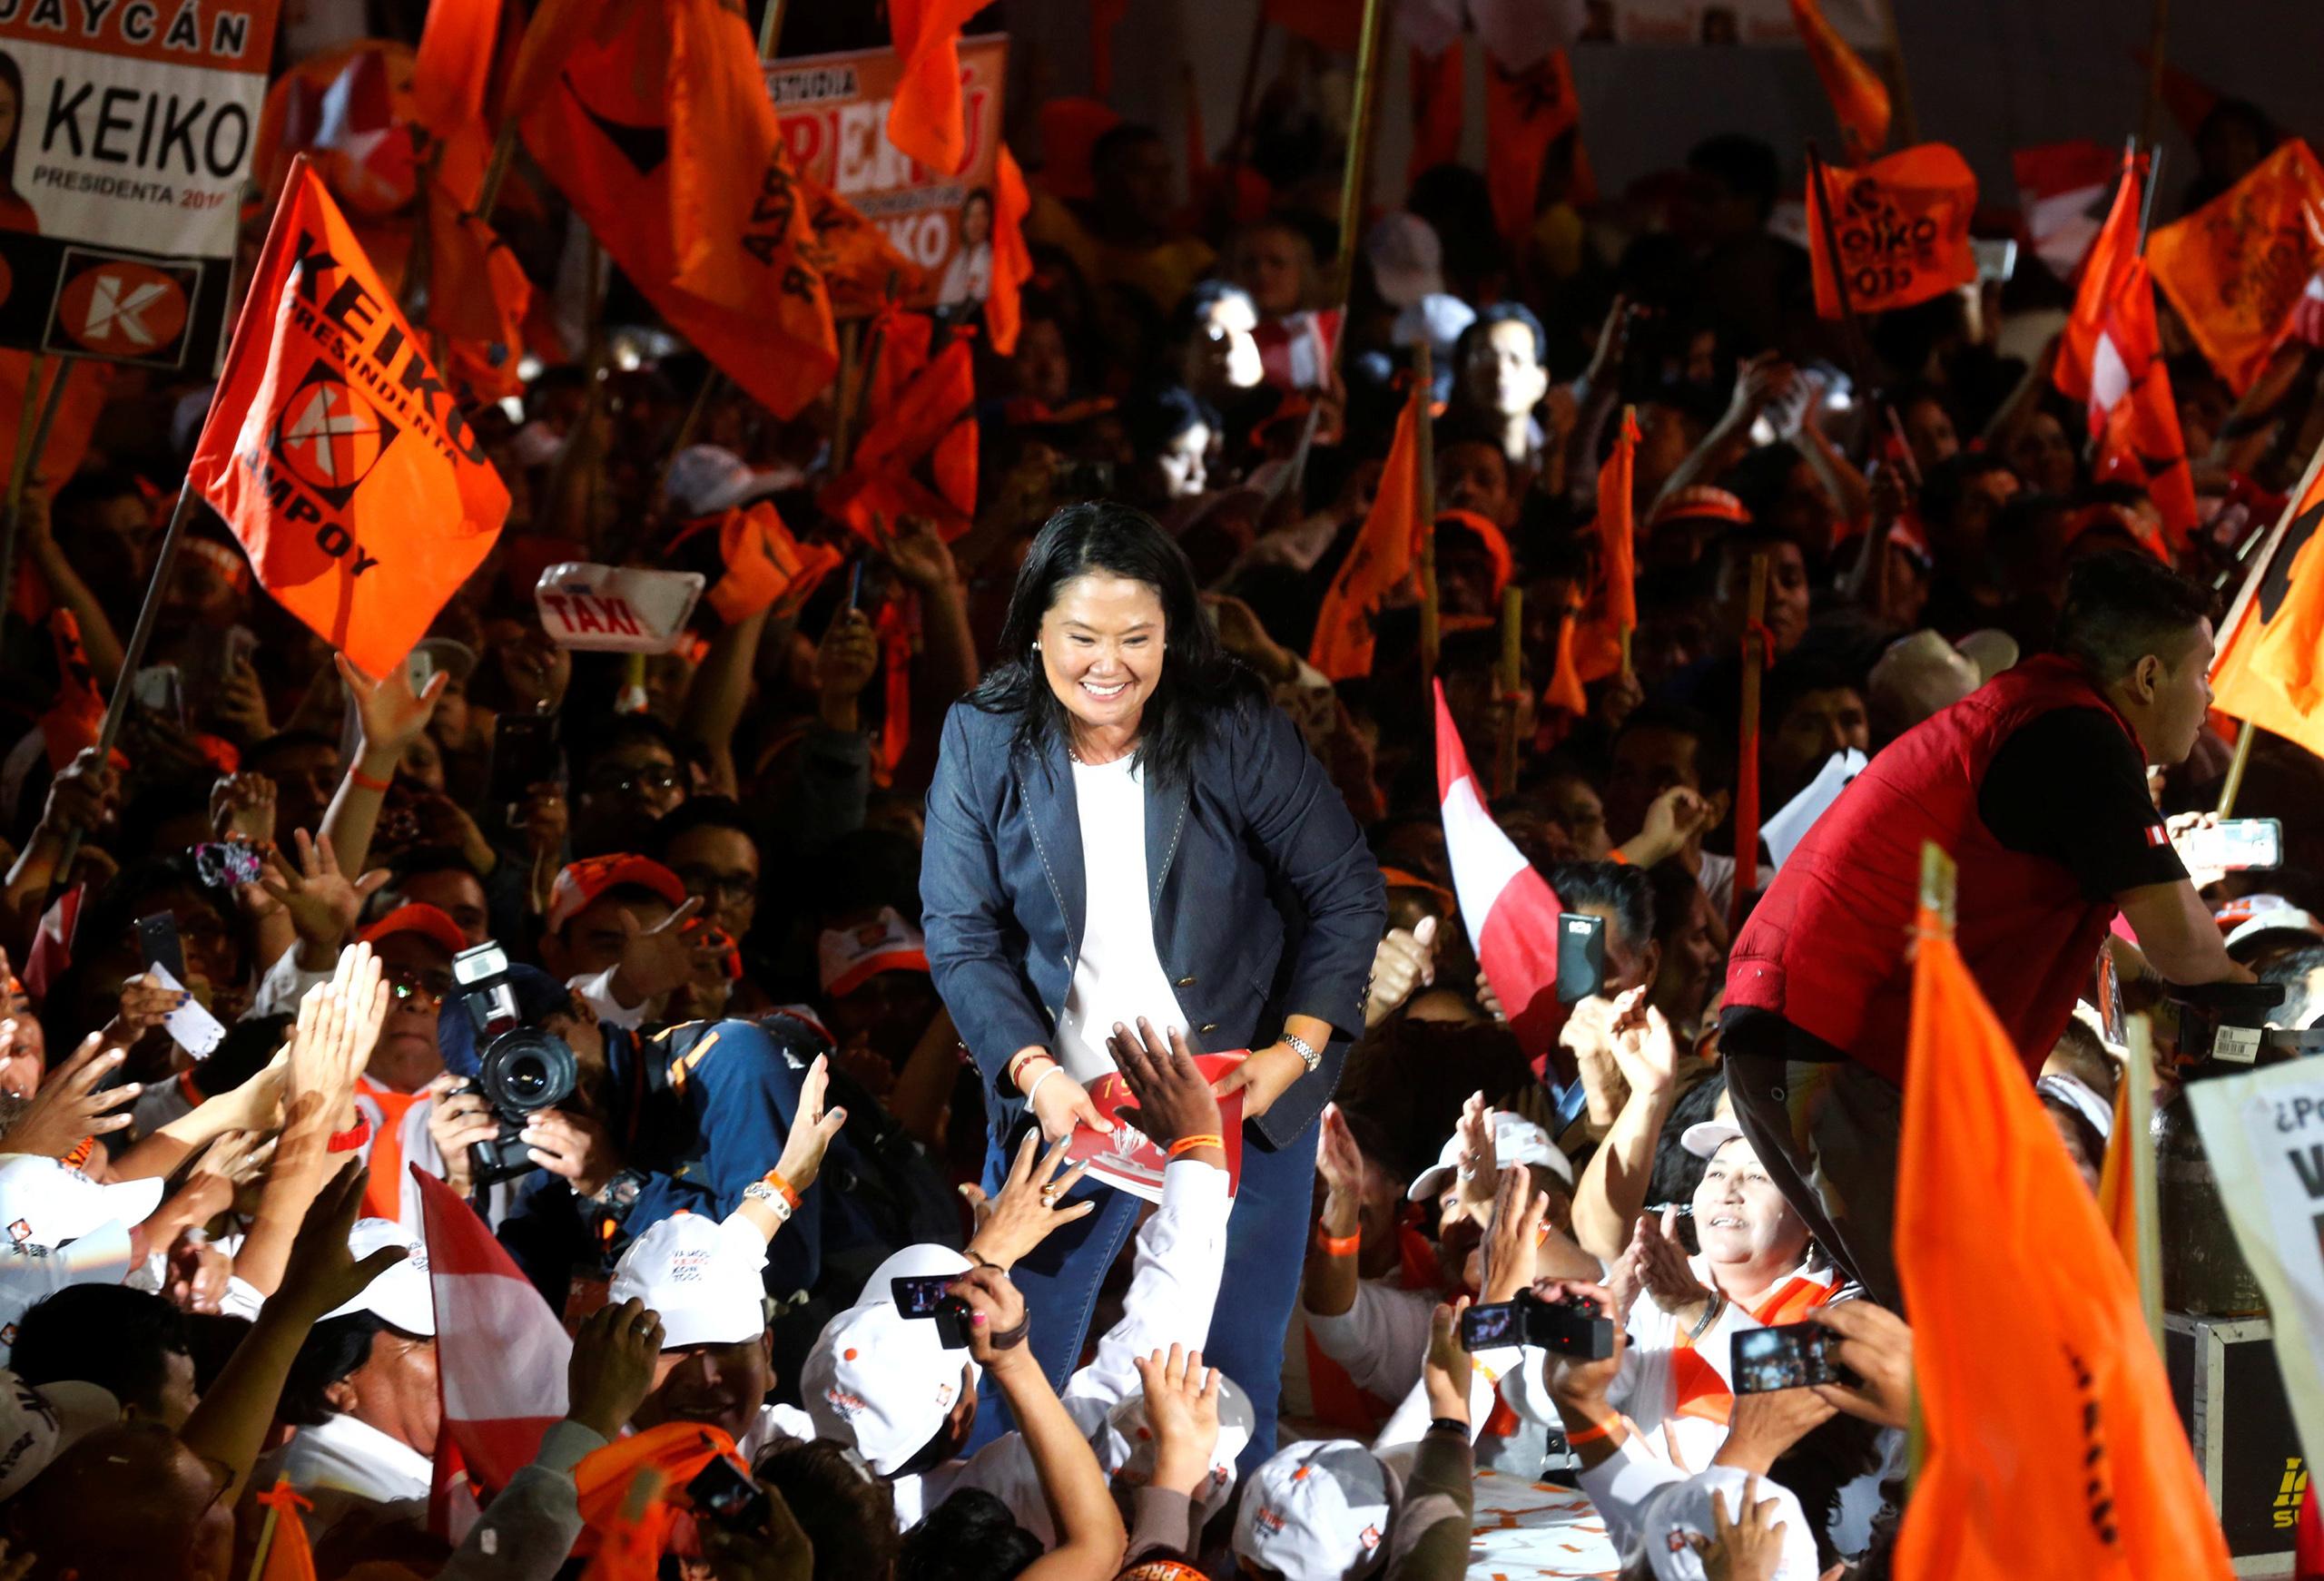 Peruvian presidential candidate Keiko Fujimori attends a closing campaign rally in Lima, June 2, 2016.